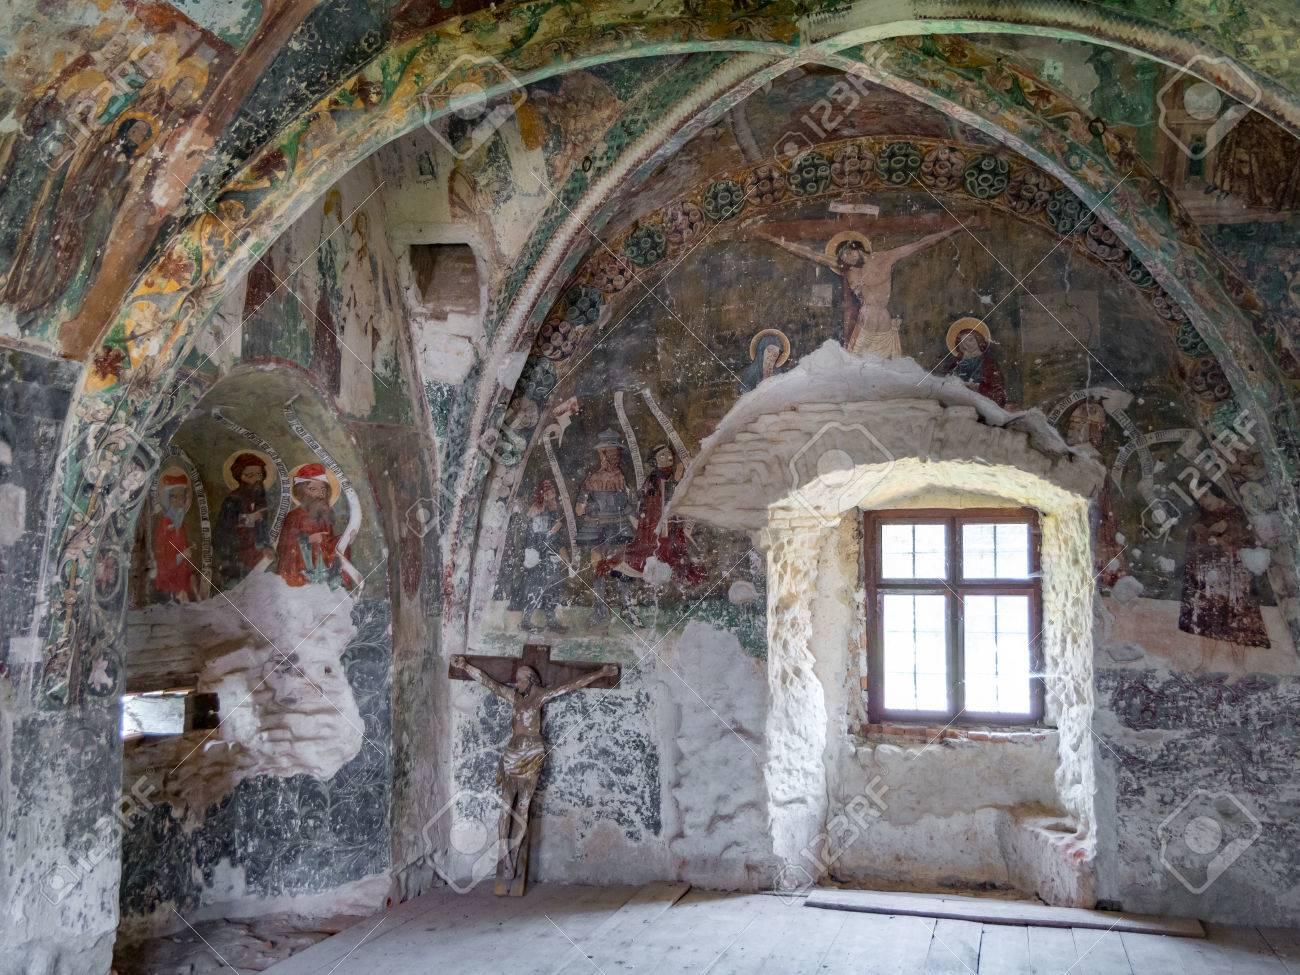 Harman, Romania, July 2017: Harman Church frescoes chapel dating back to the 13th century - 83120801